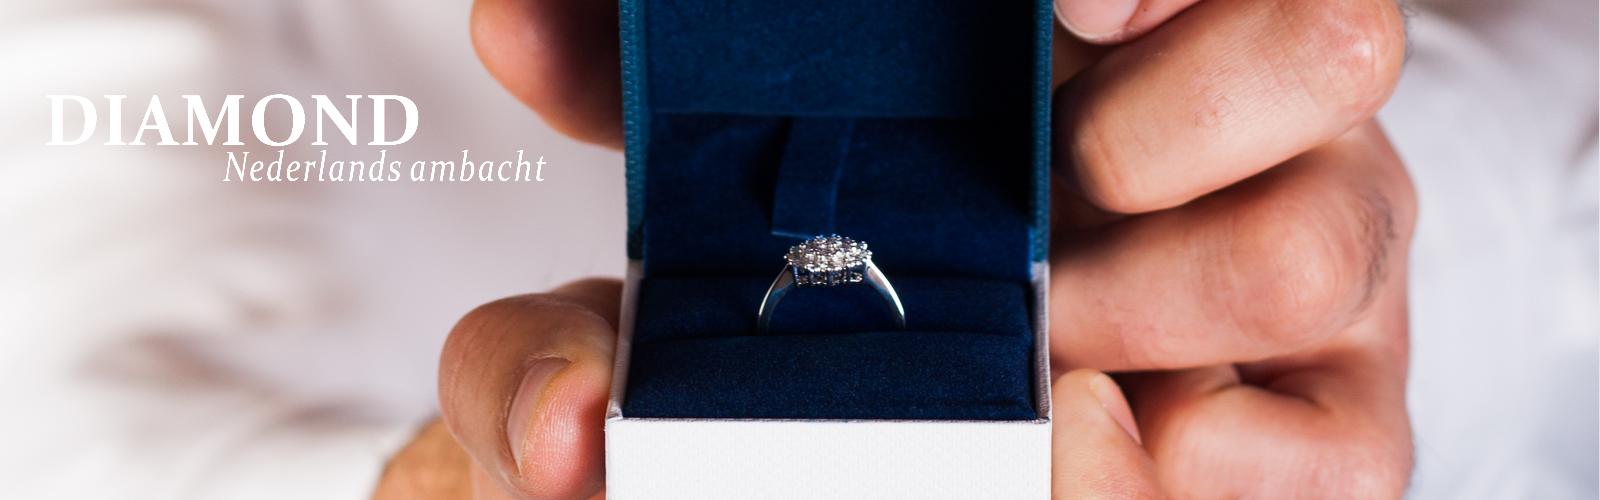 Diamond Wolters Juweliers Coevorden Emmen